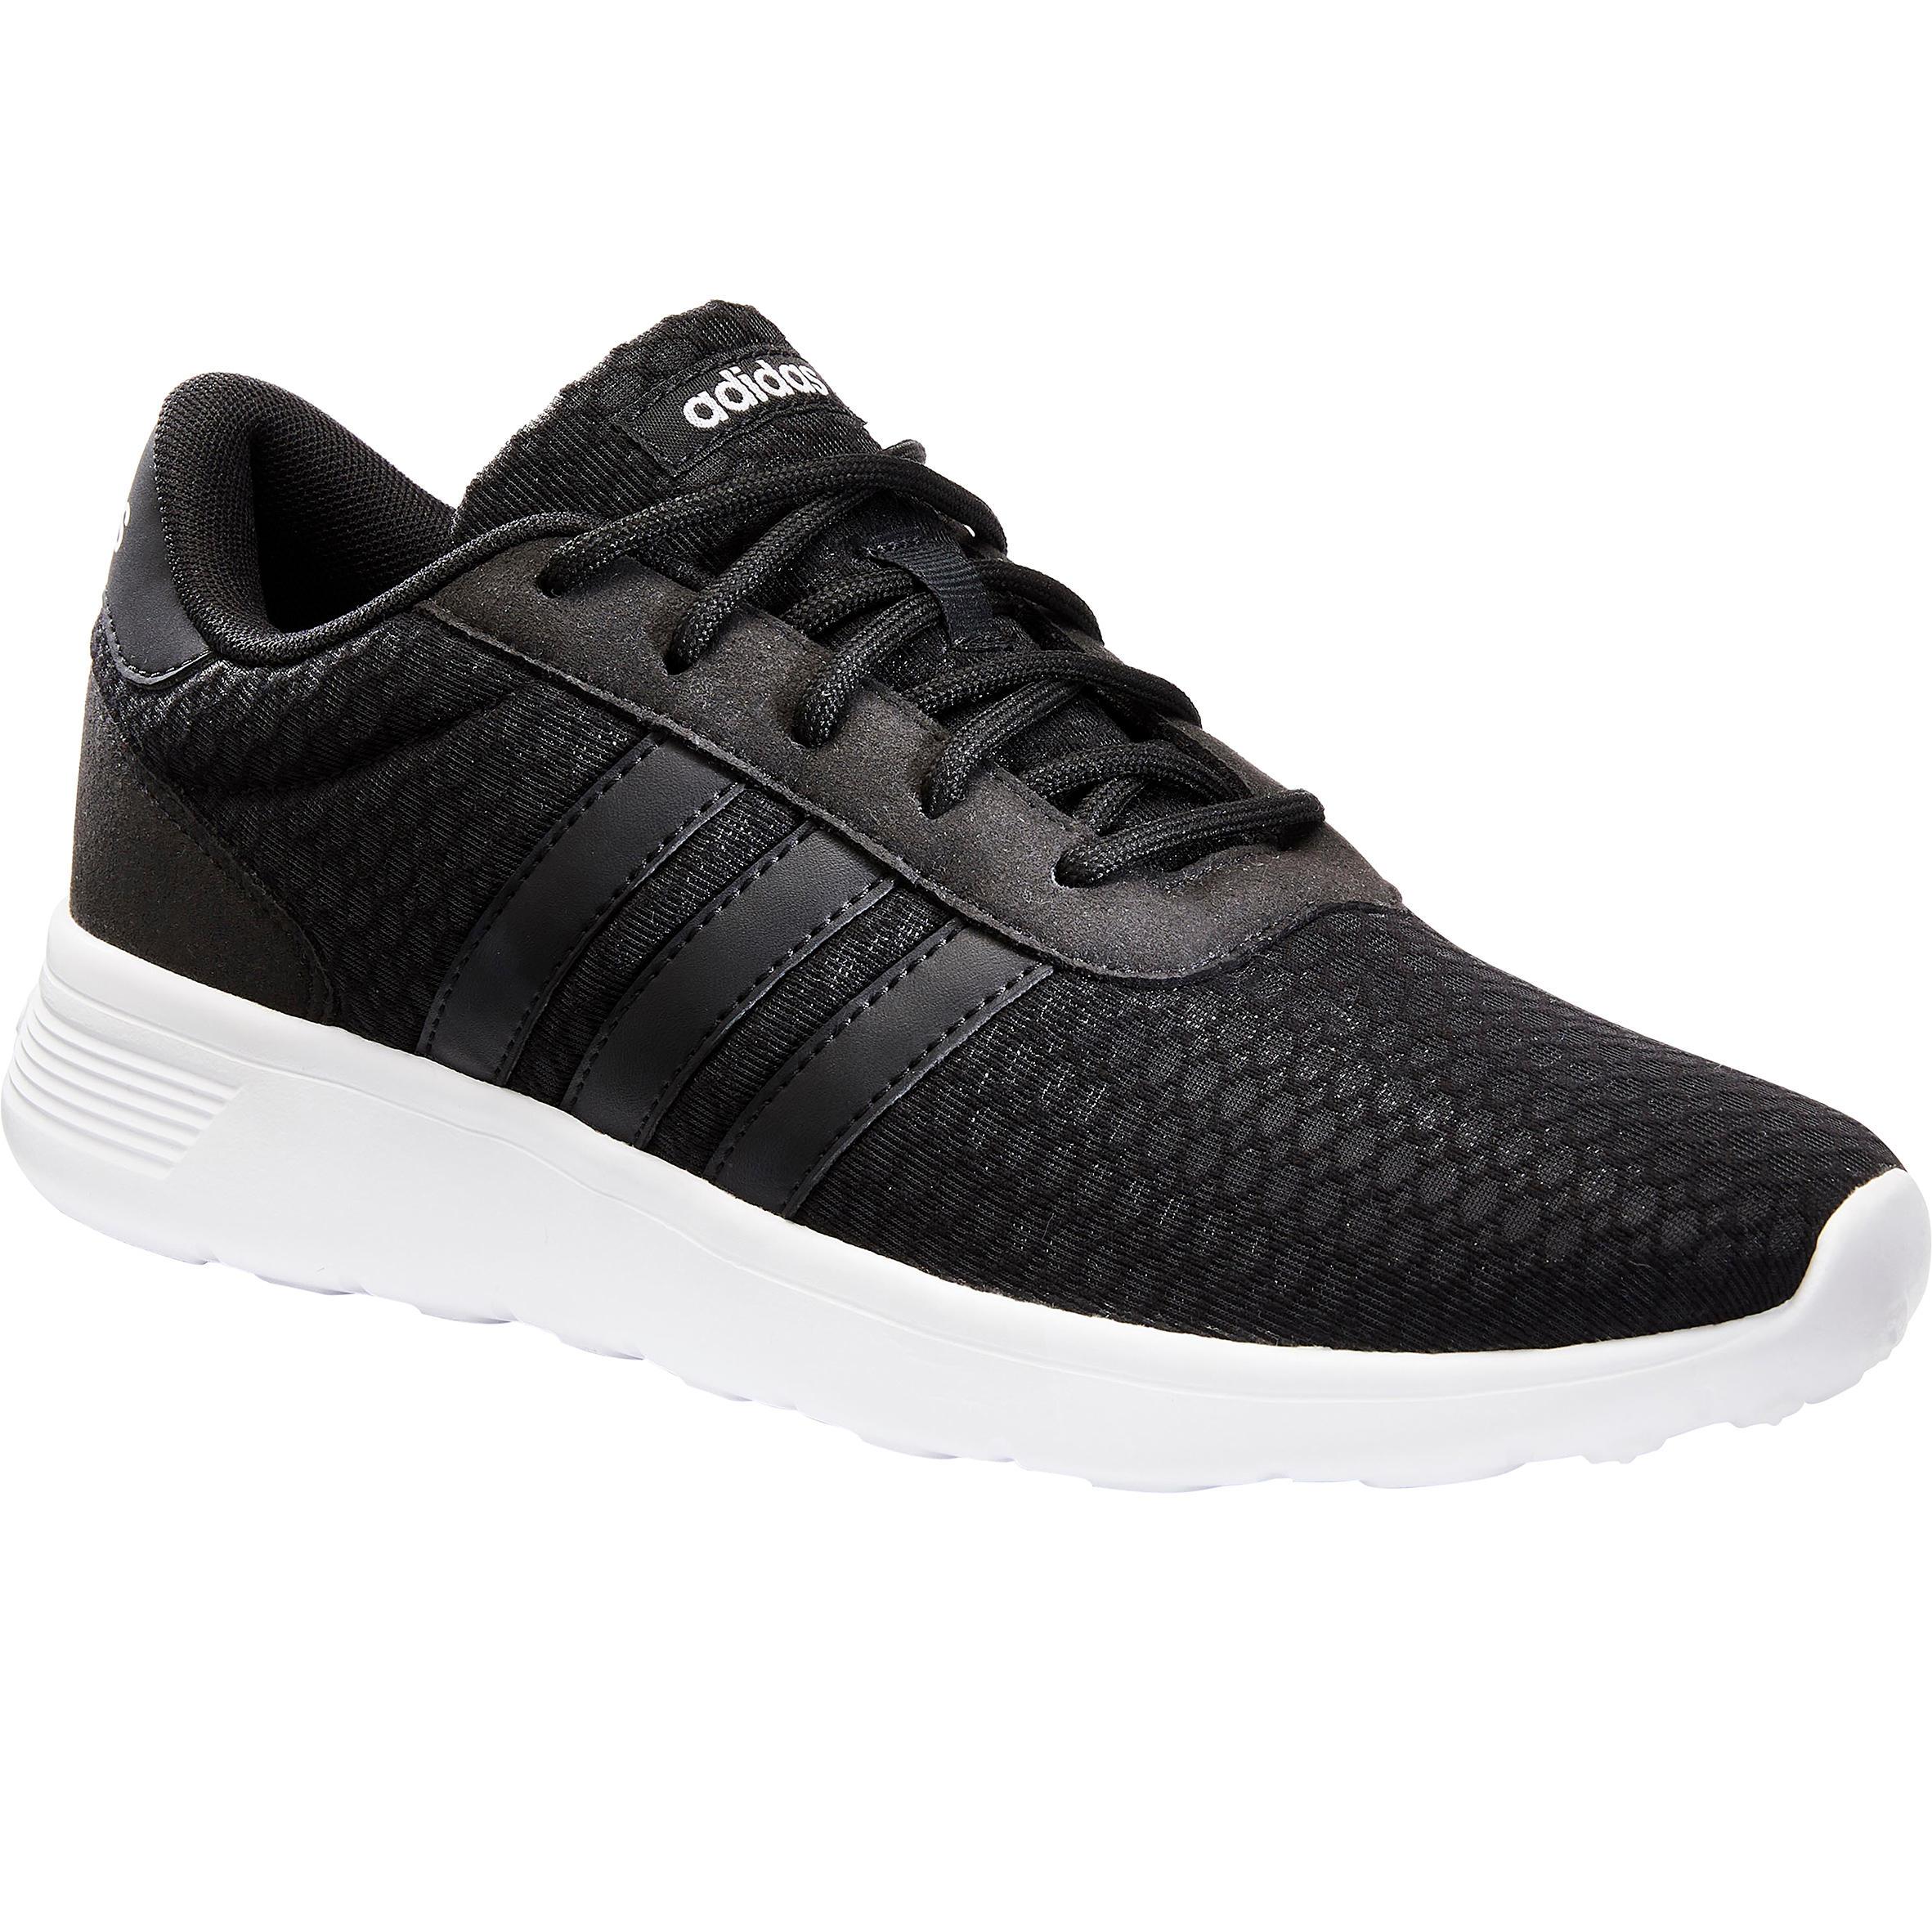 Chaussures marche sportive femme lite racer noir adidas